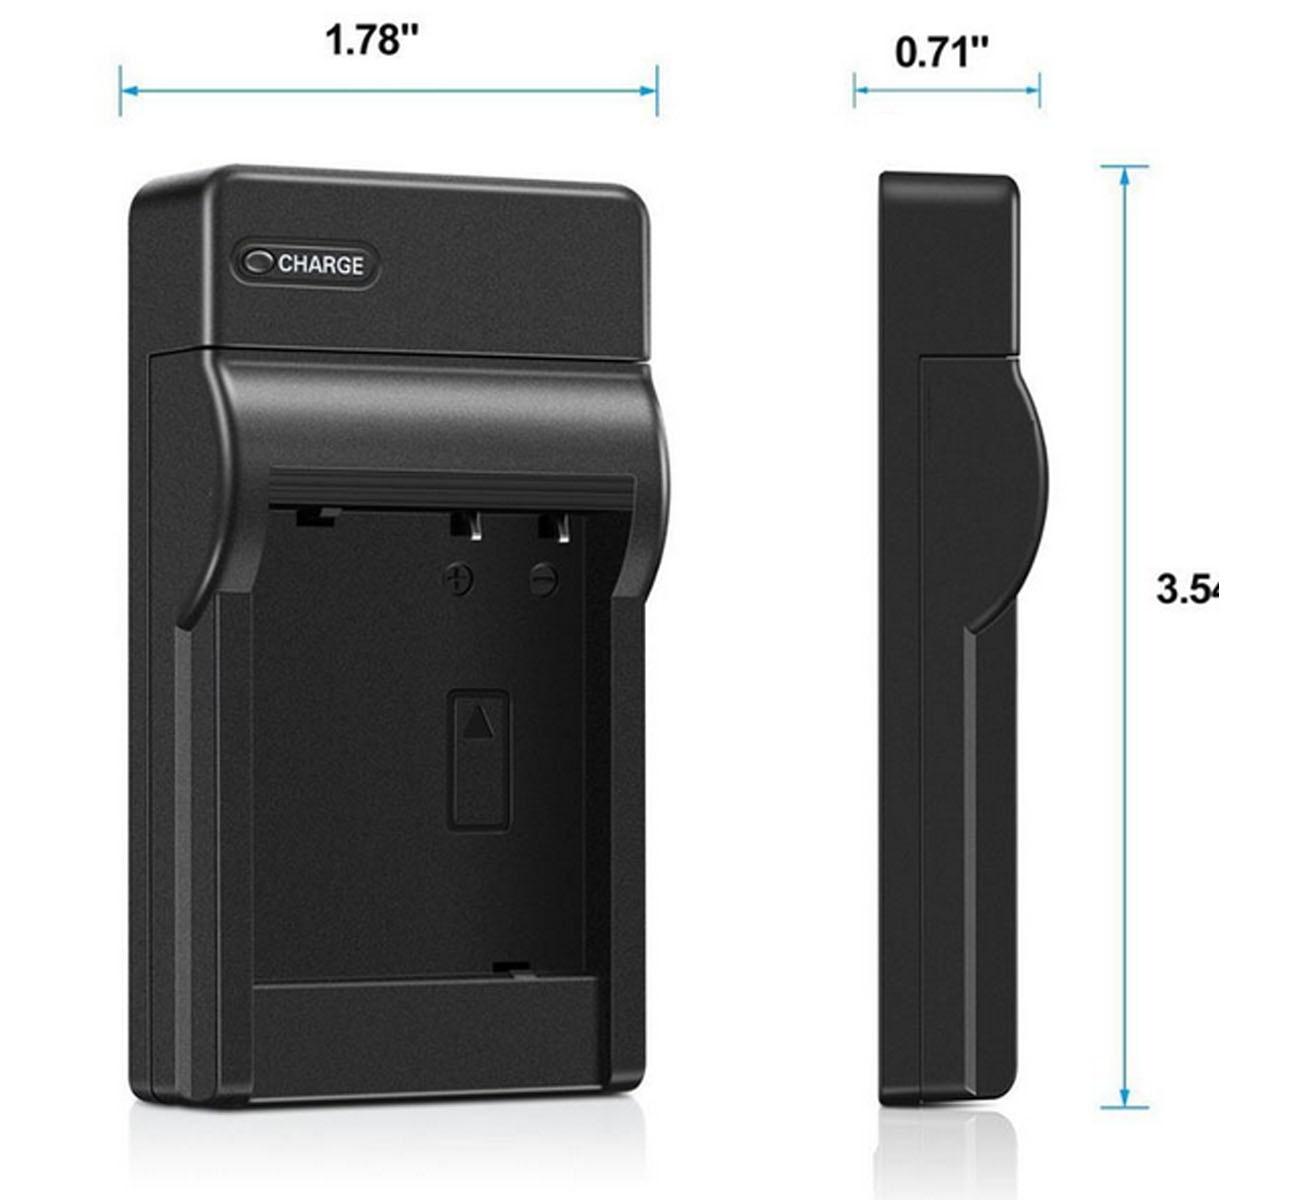 VP-D63 VP-D65 Digital Video Camcorder VP-D60 Battery Pack and LCD USB Travel Charger for Samsung VP-D55